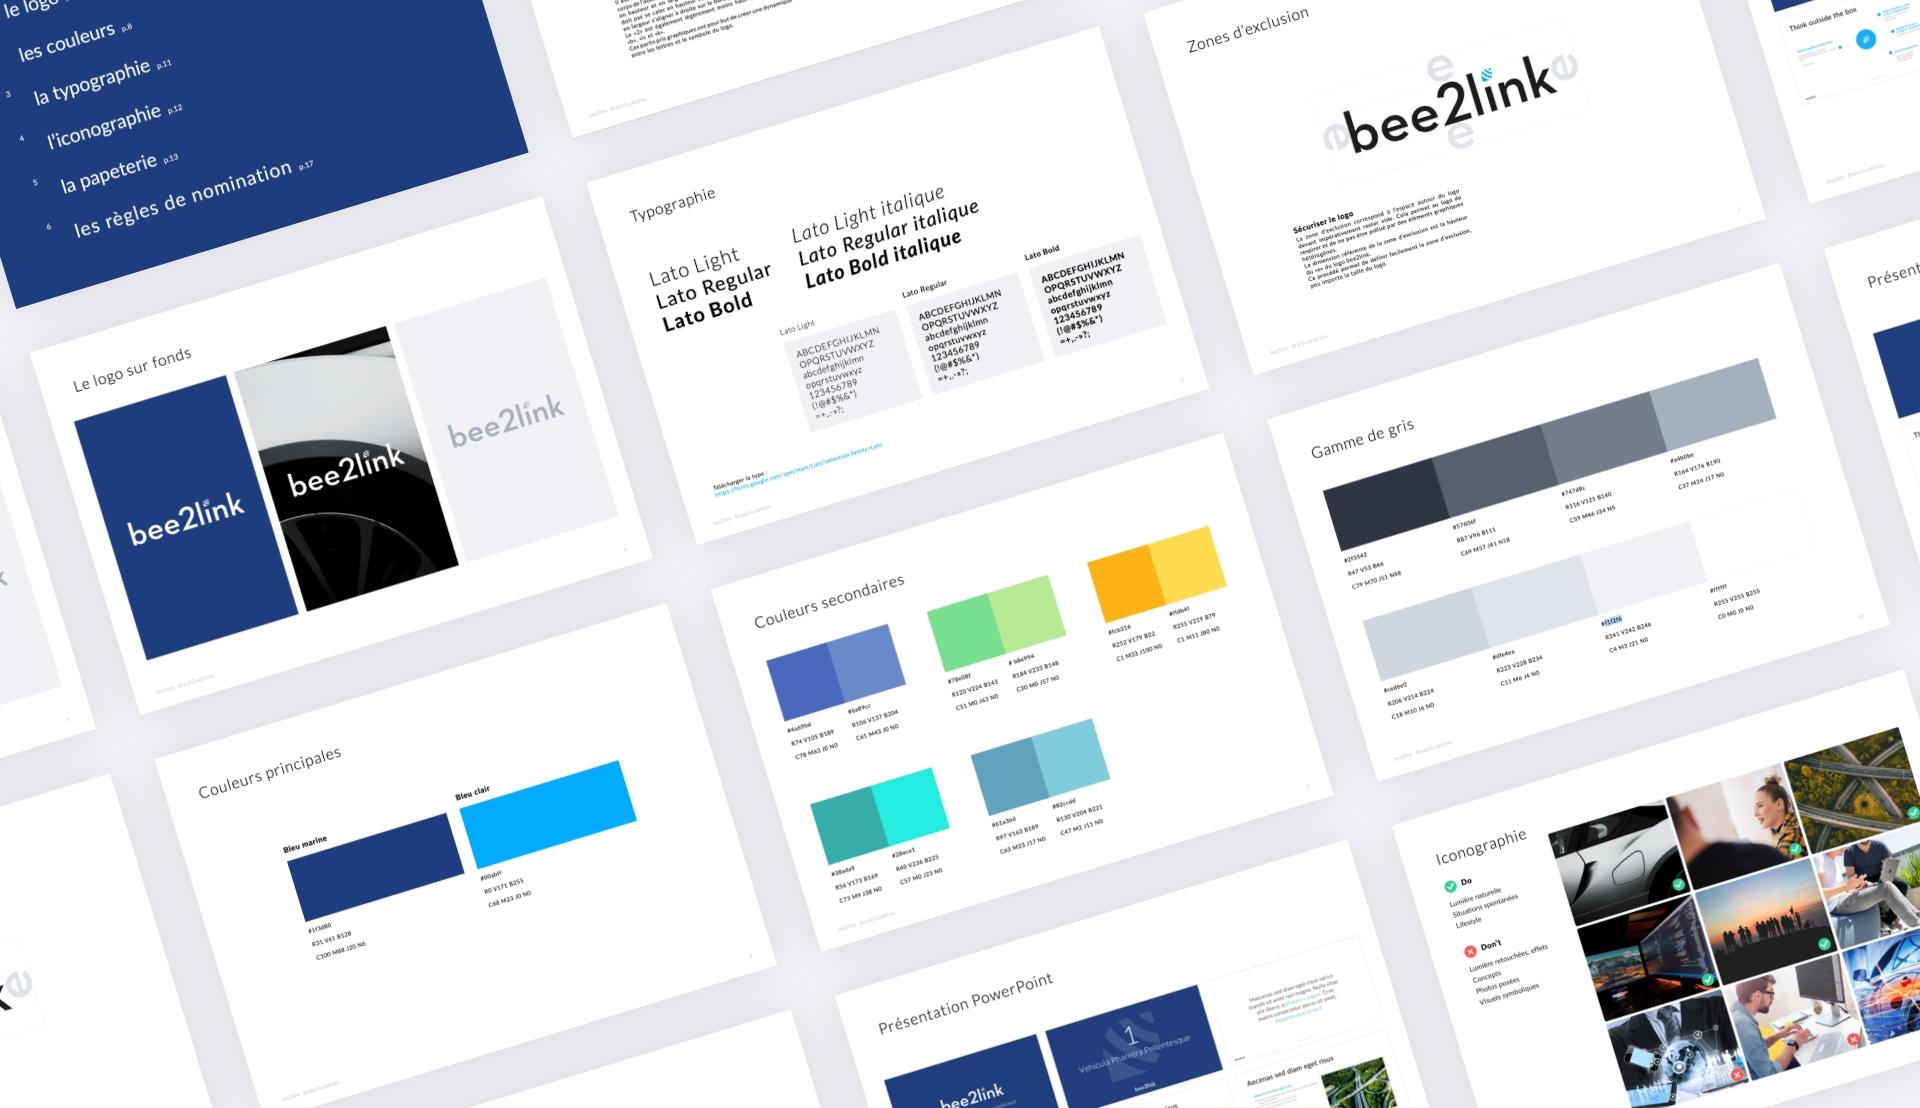 bee2link branding image de marque identité charte graphique sharing agency